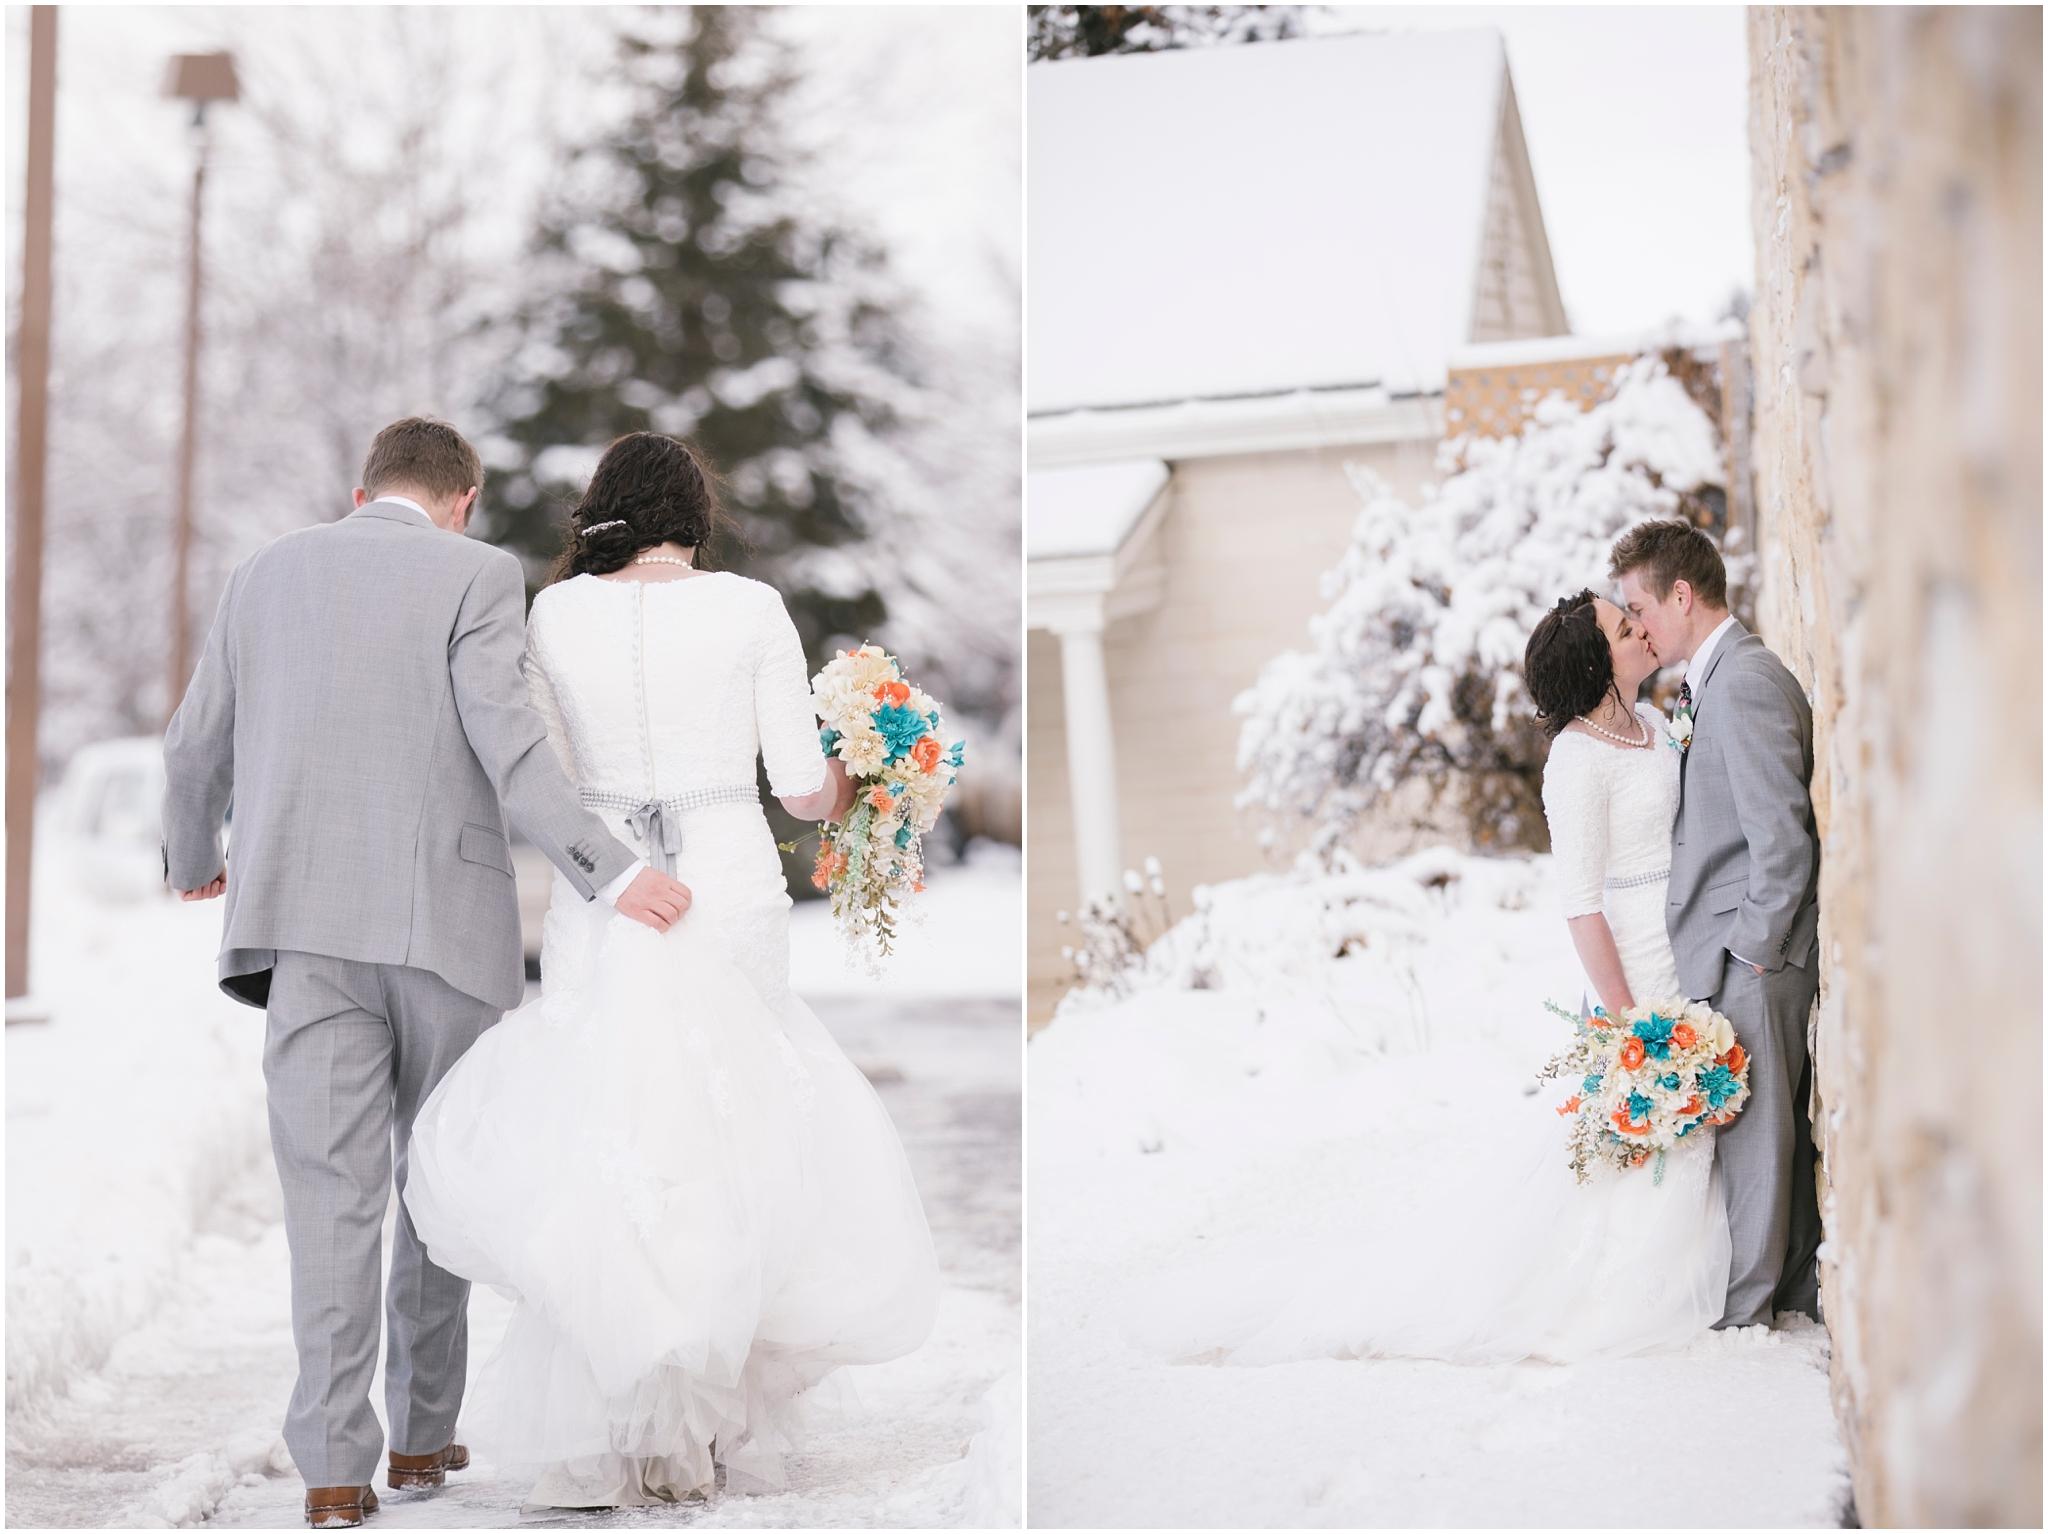 Bo Alyssa Wedding-139_Lizzie-B-Imagery-Utah-Wedding-Photographer-Central-Utah-Photographer-Utah-County-Manti-Temple.jpg